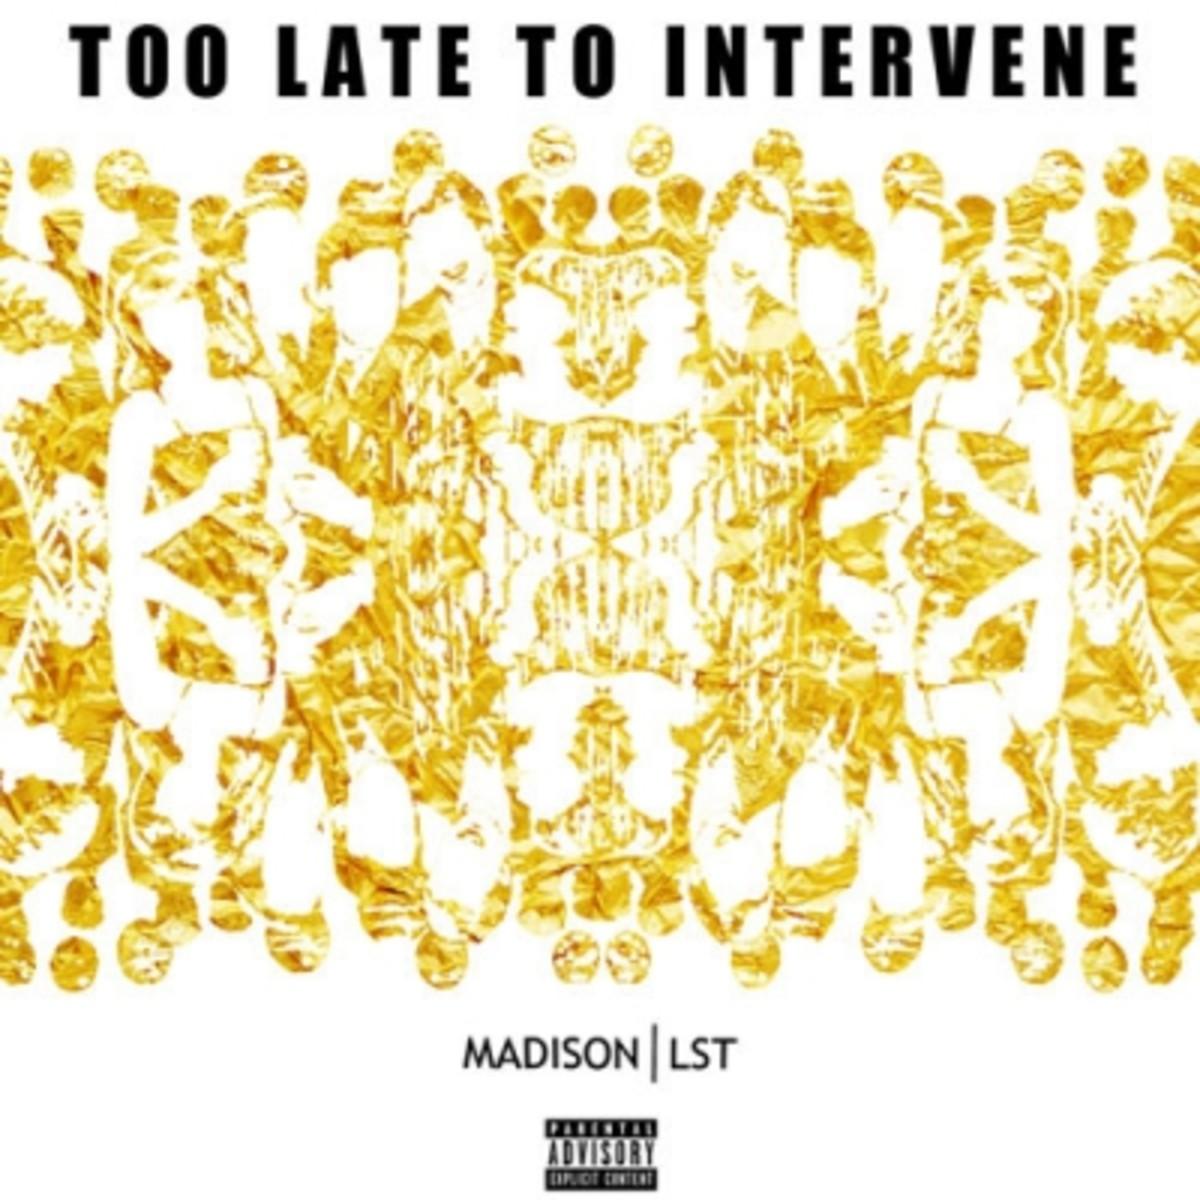 madisonlst-too-late-to-intervene.jpg